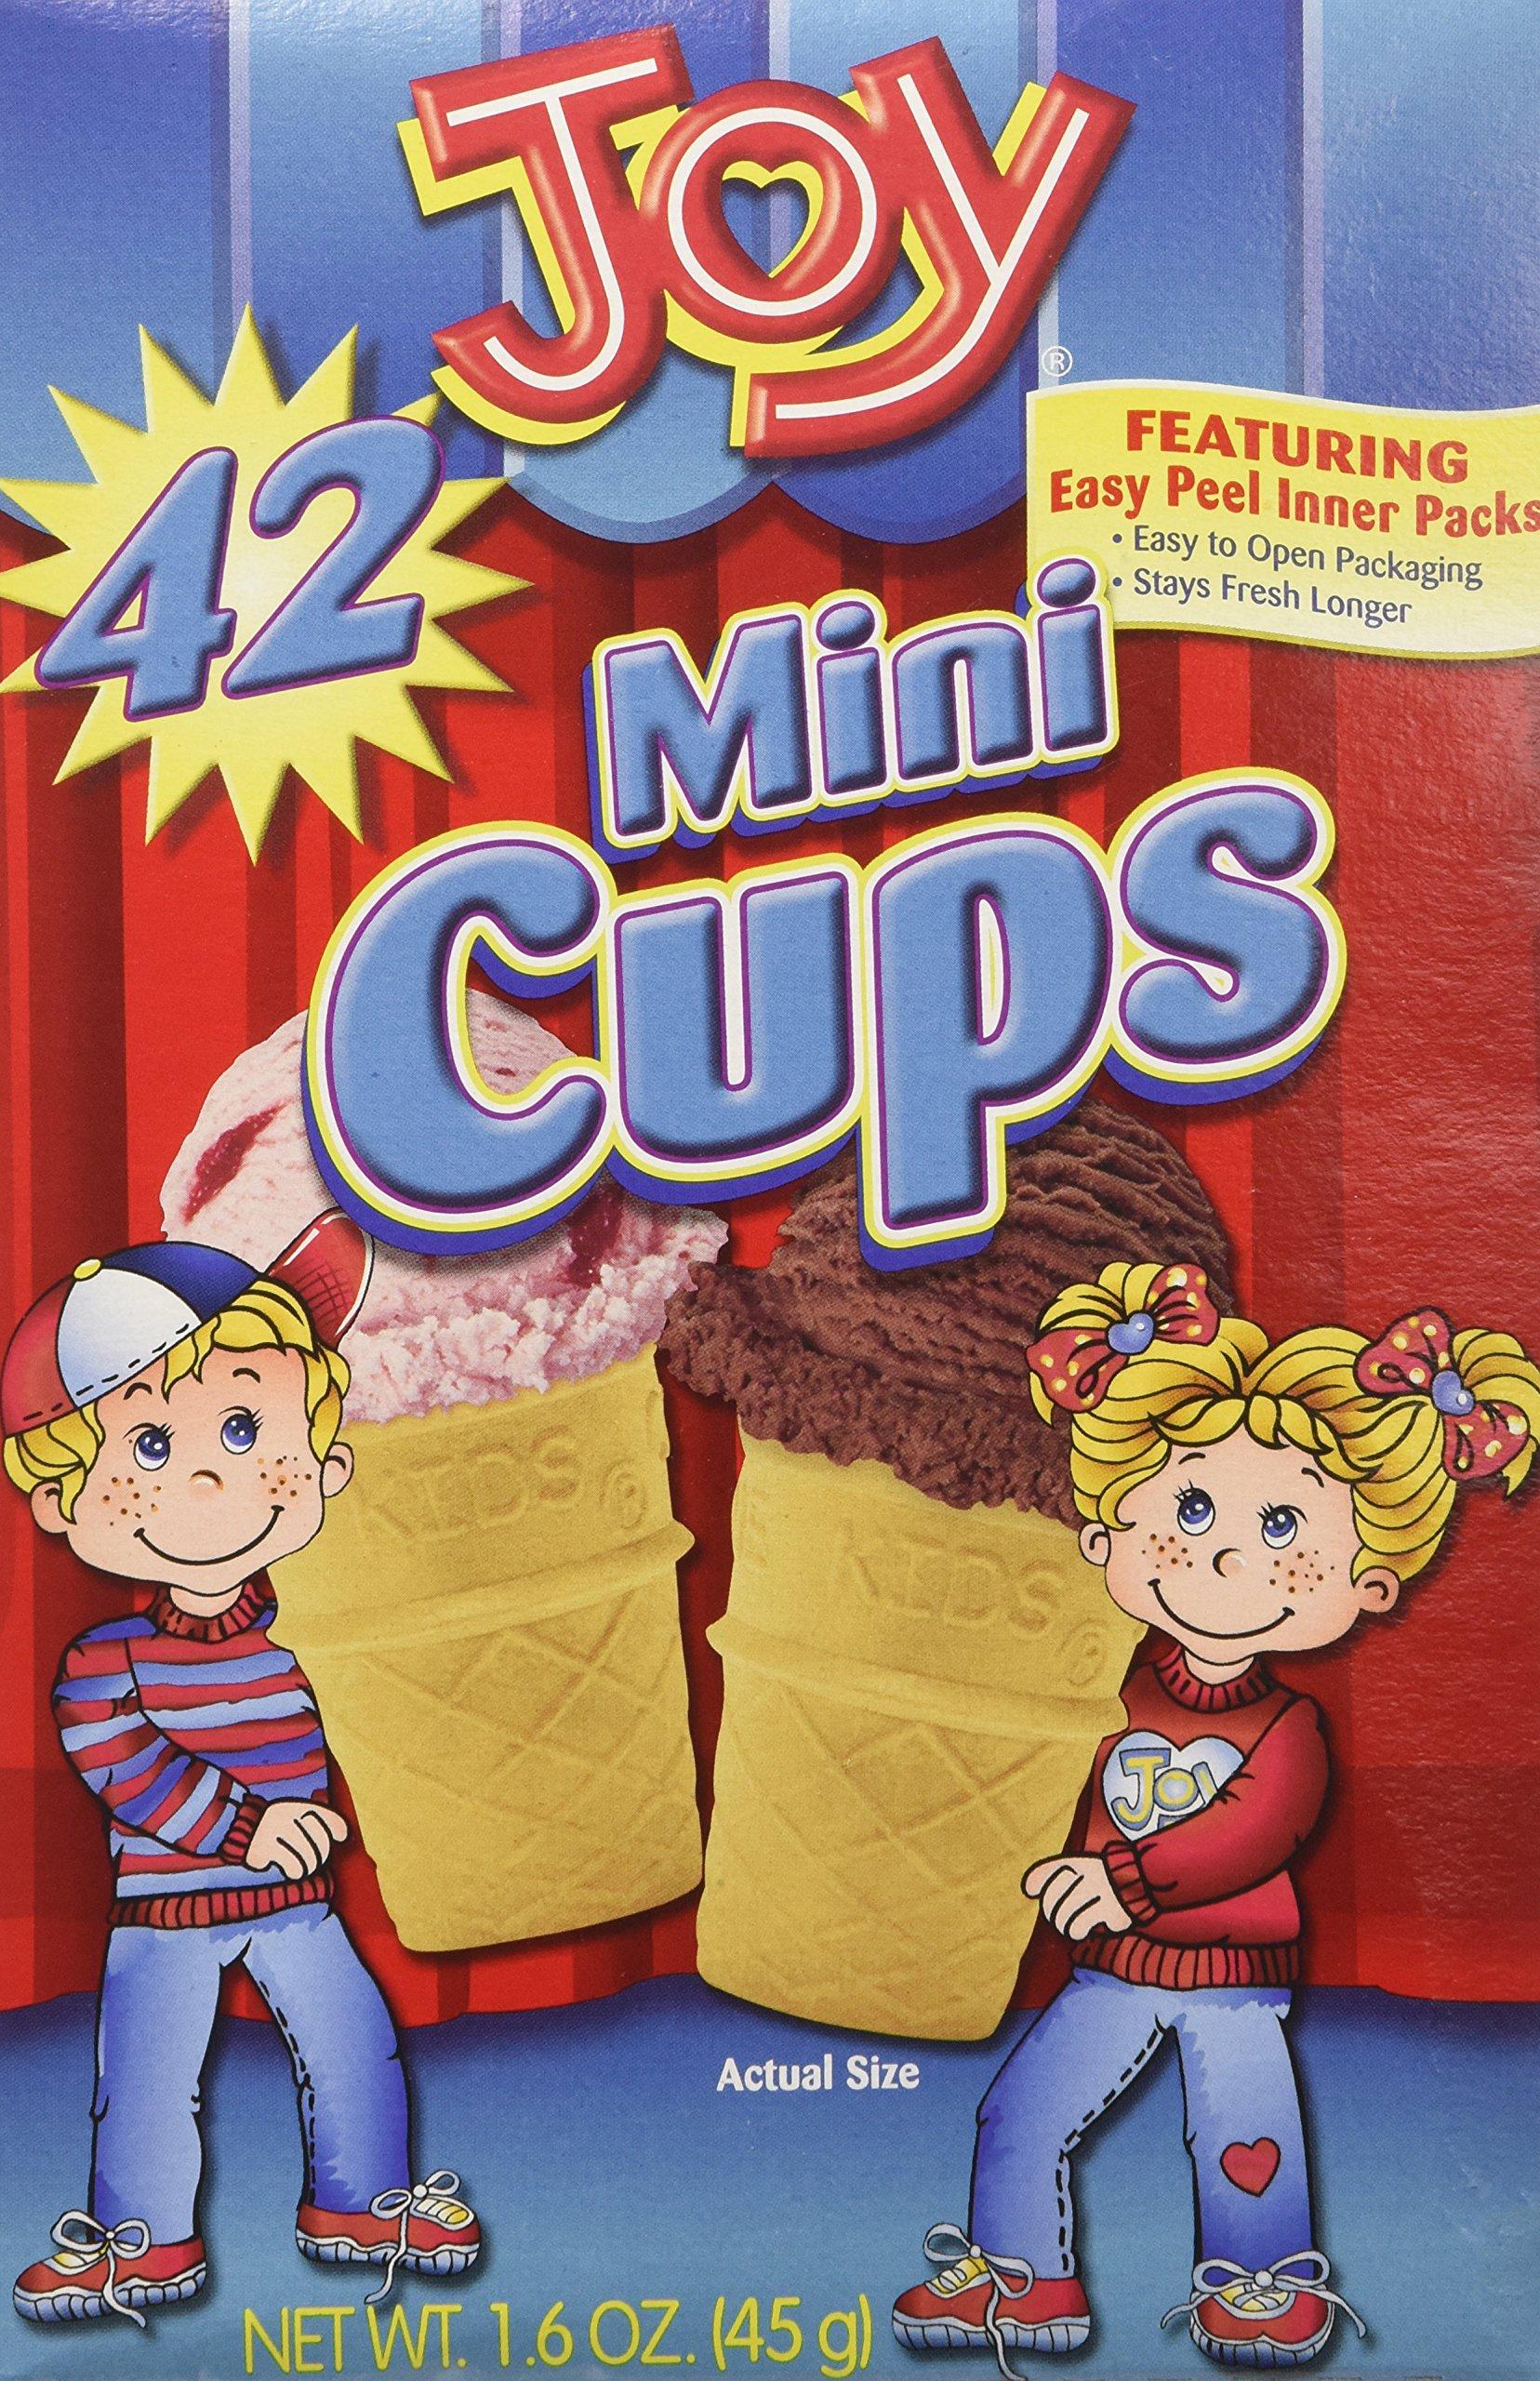 amazoncom joy cone 24count ice cream cups 35oz 2 pack - HD1656×2560